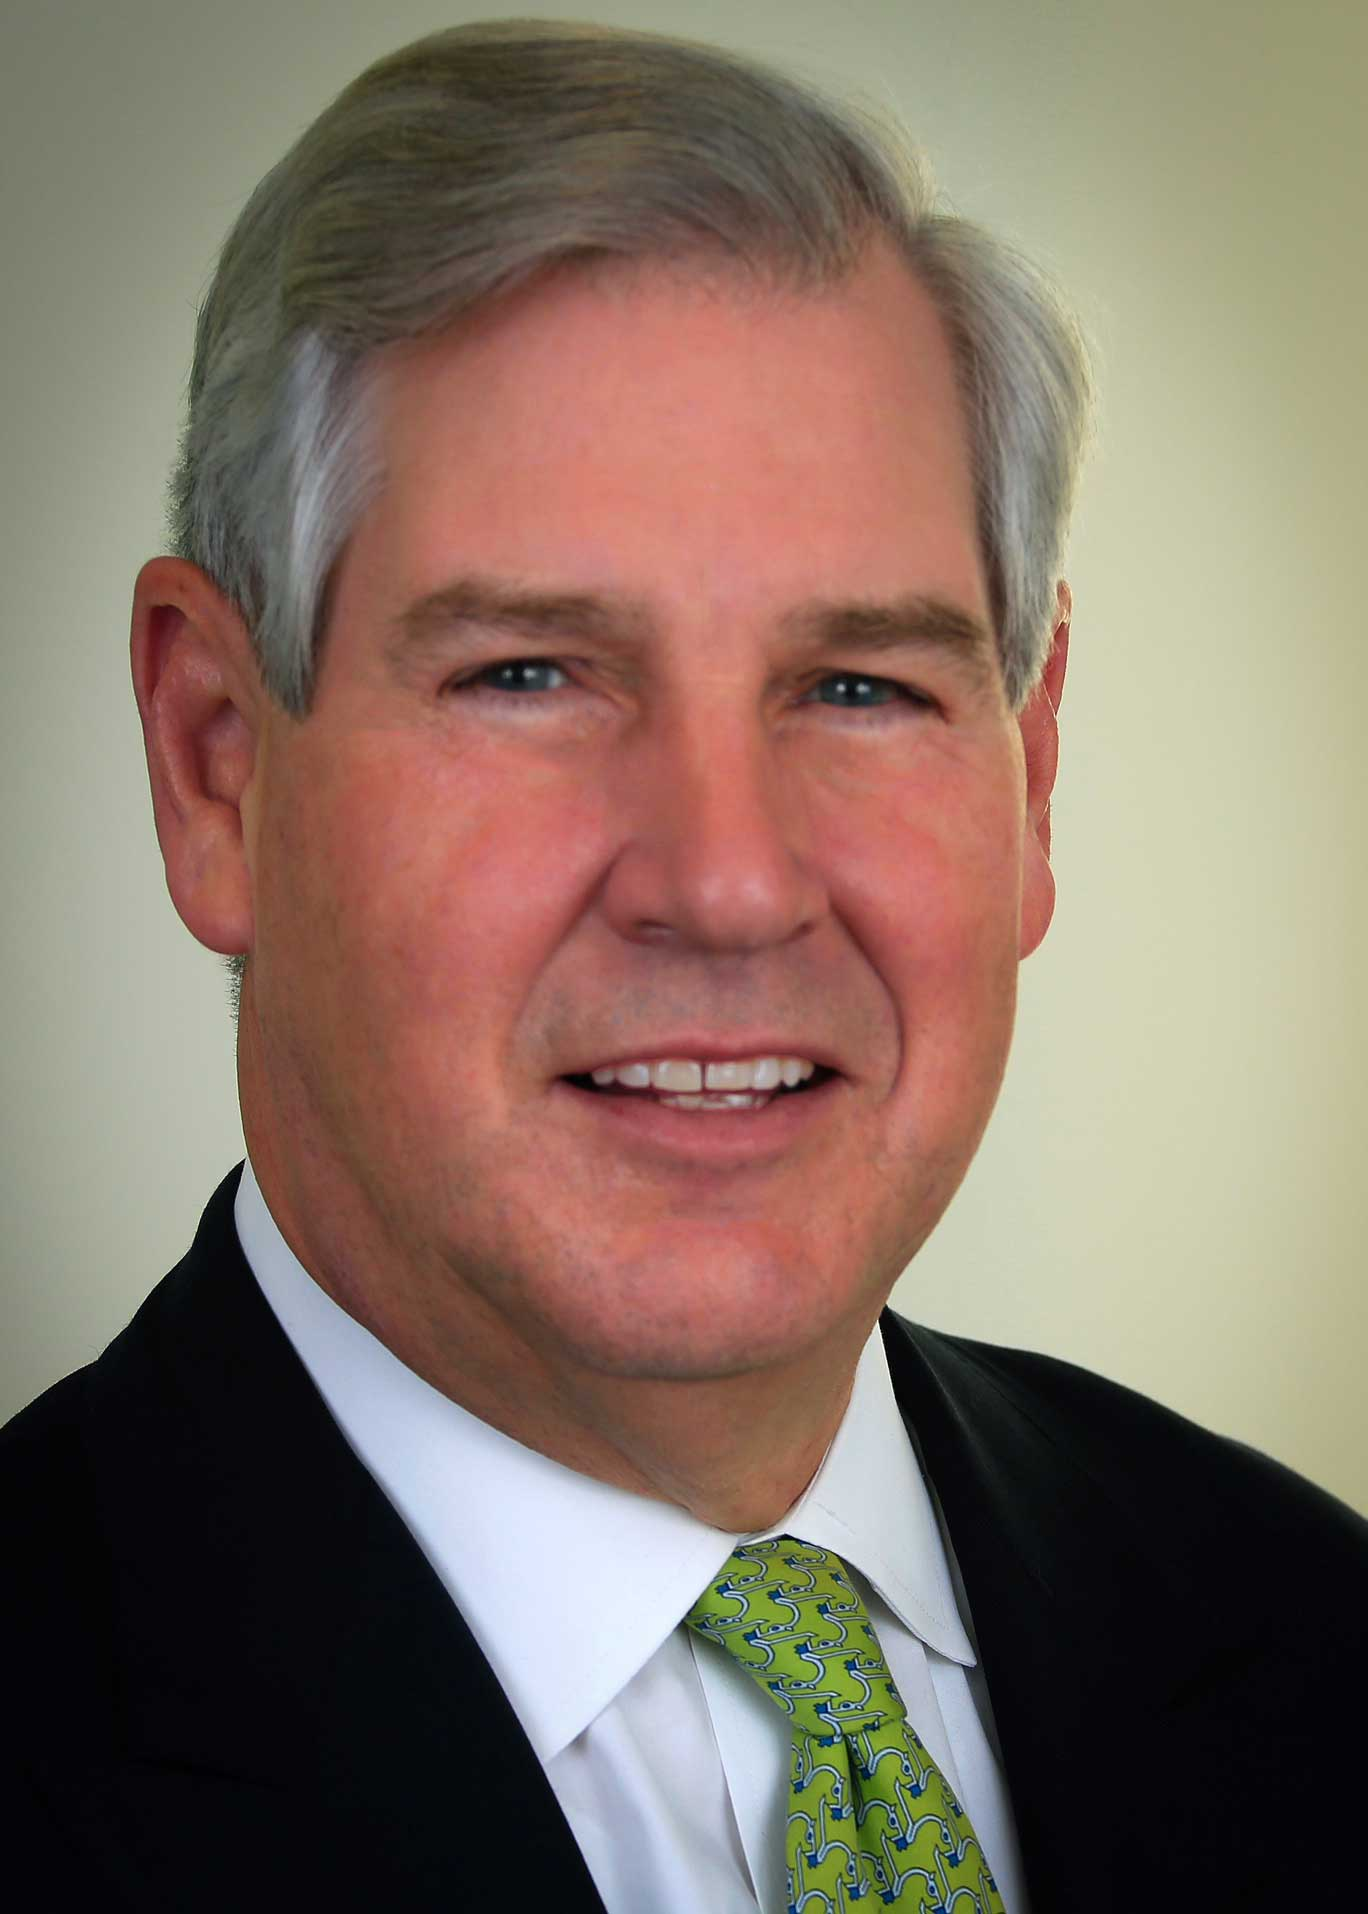 John J. Castellani, President and CEO, PhRMA